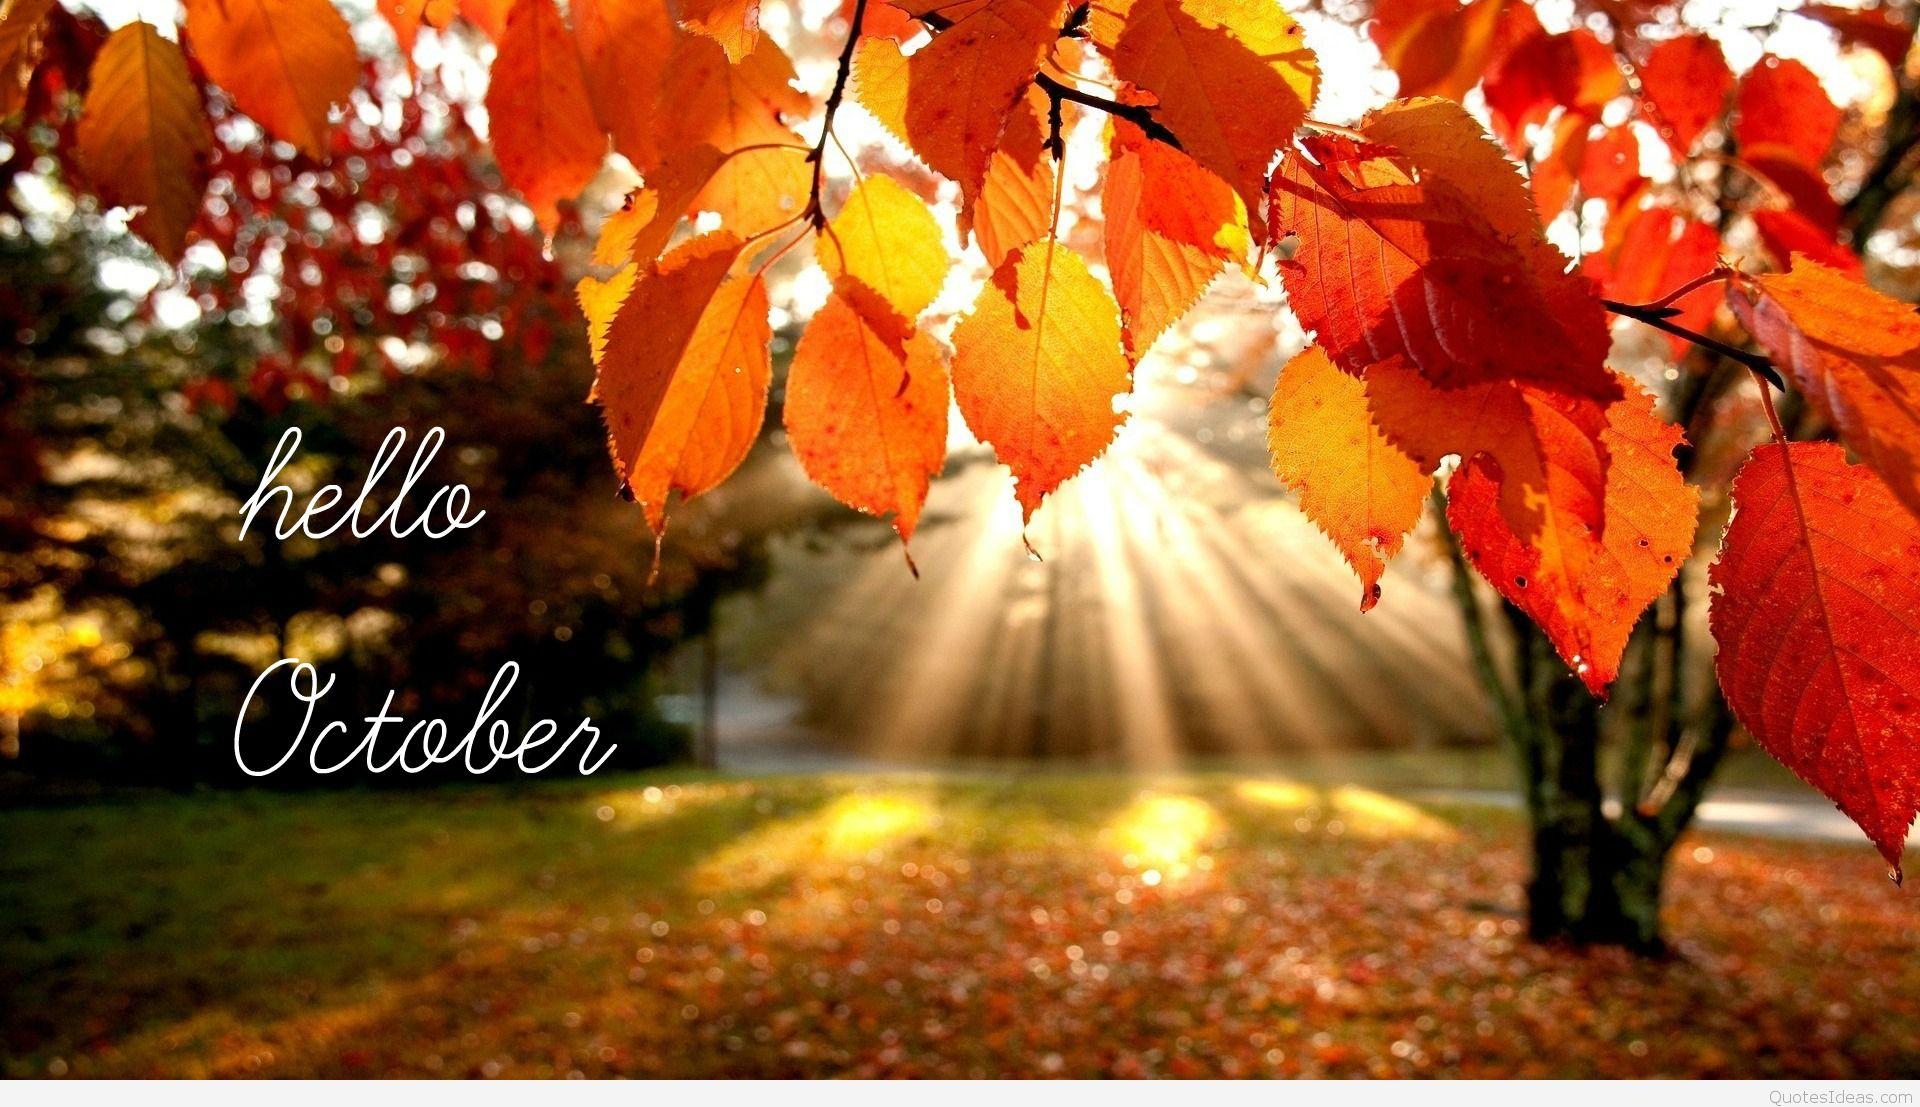 October Month Photos